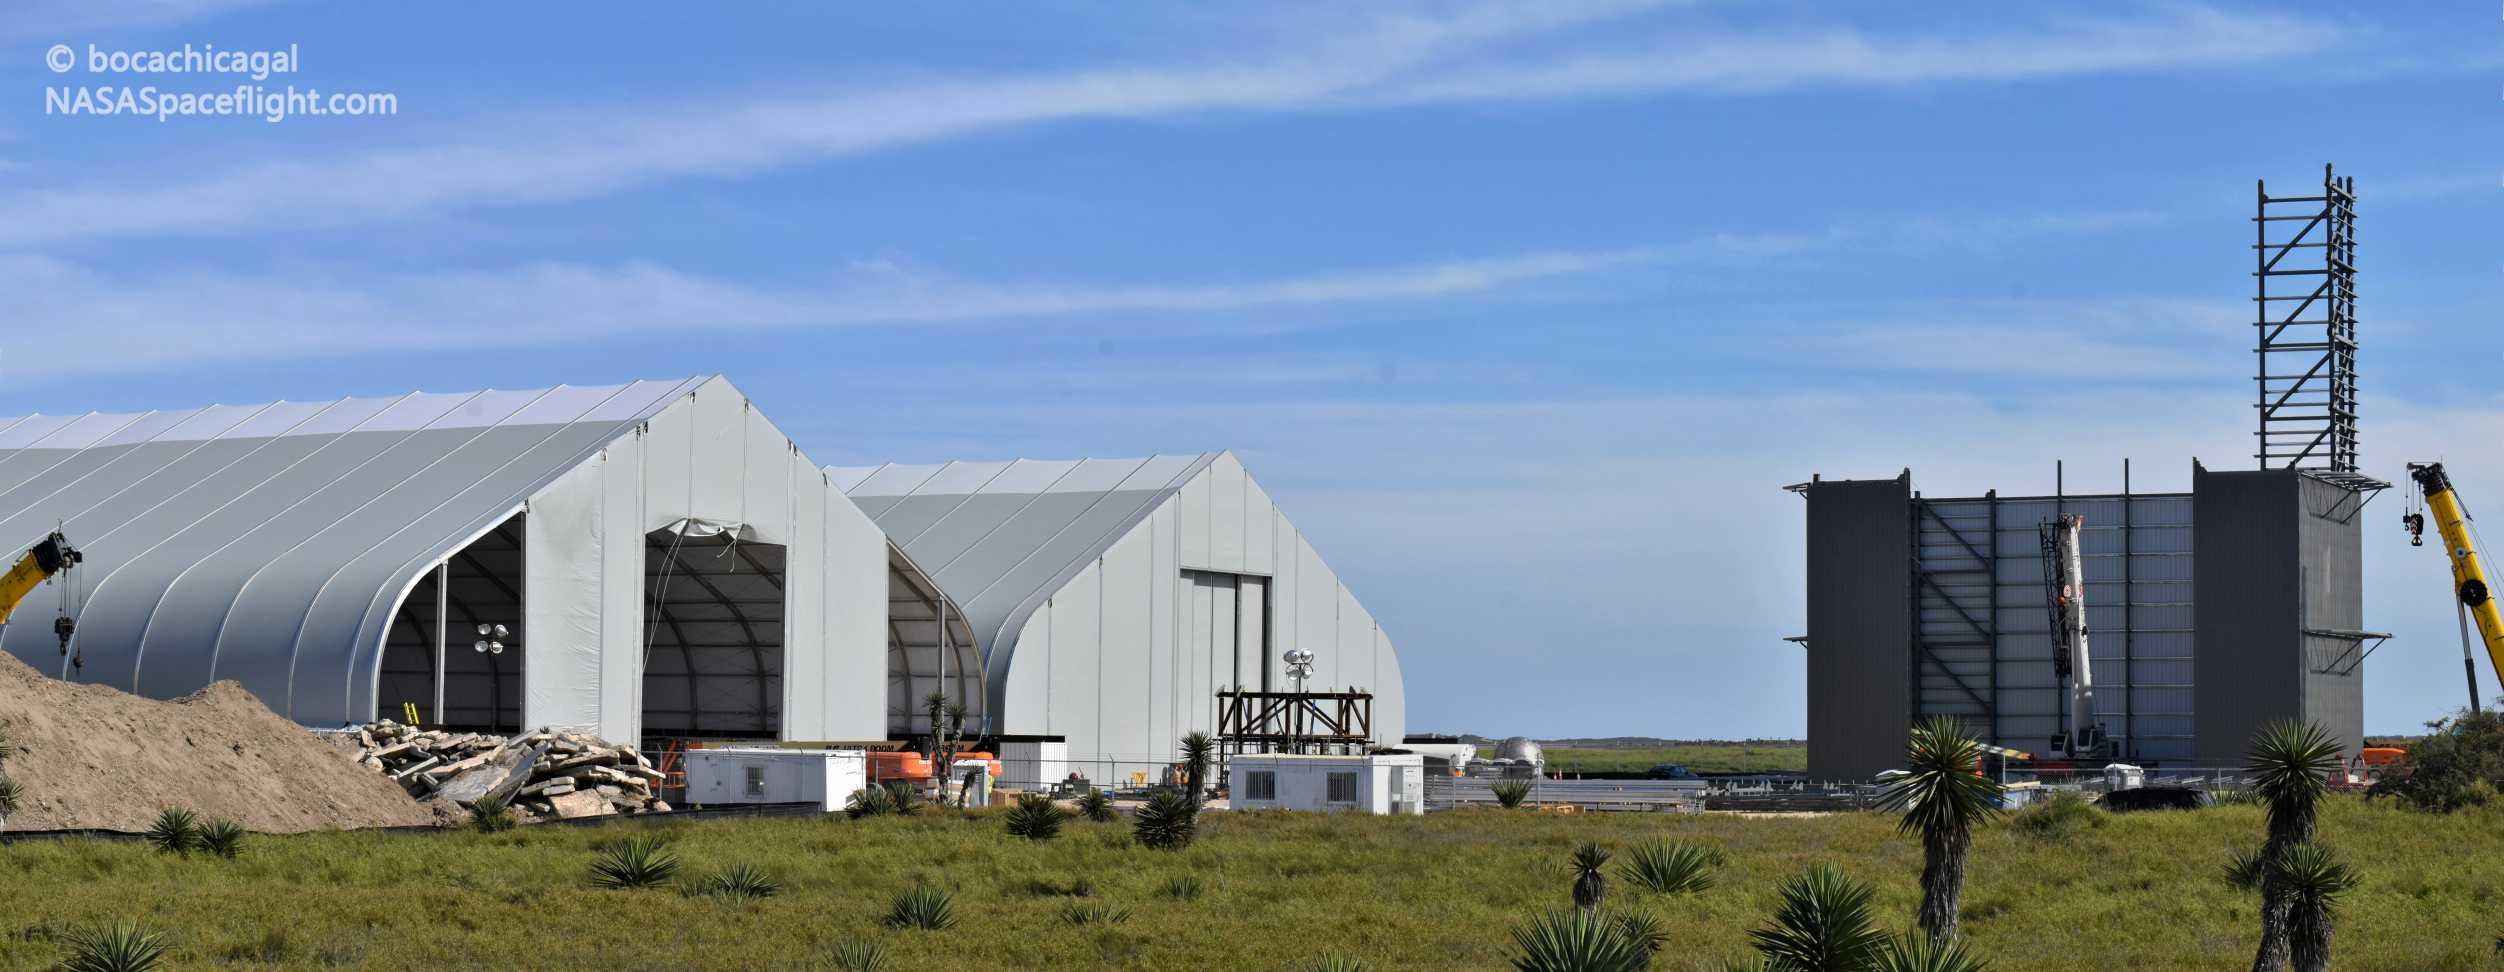 Starship Boca Chica 020220 (NASASpaceflight – bocachicagal) tent + VAB pano 1 (c)